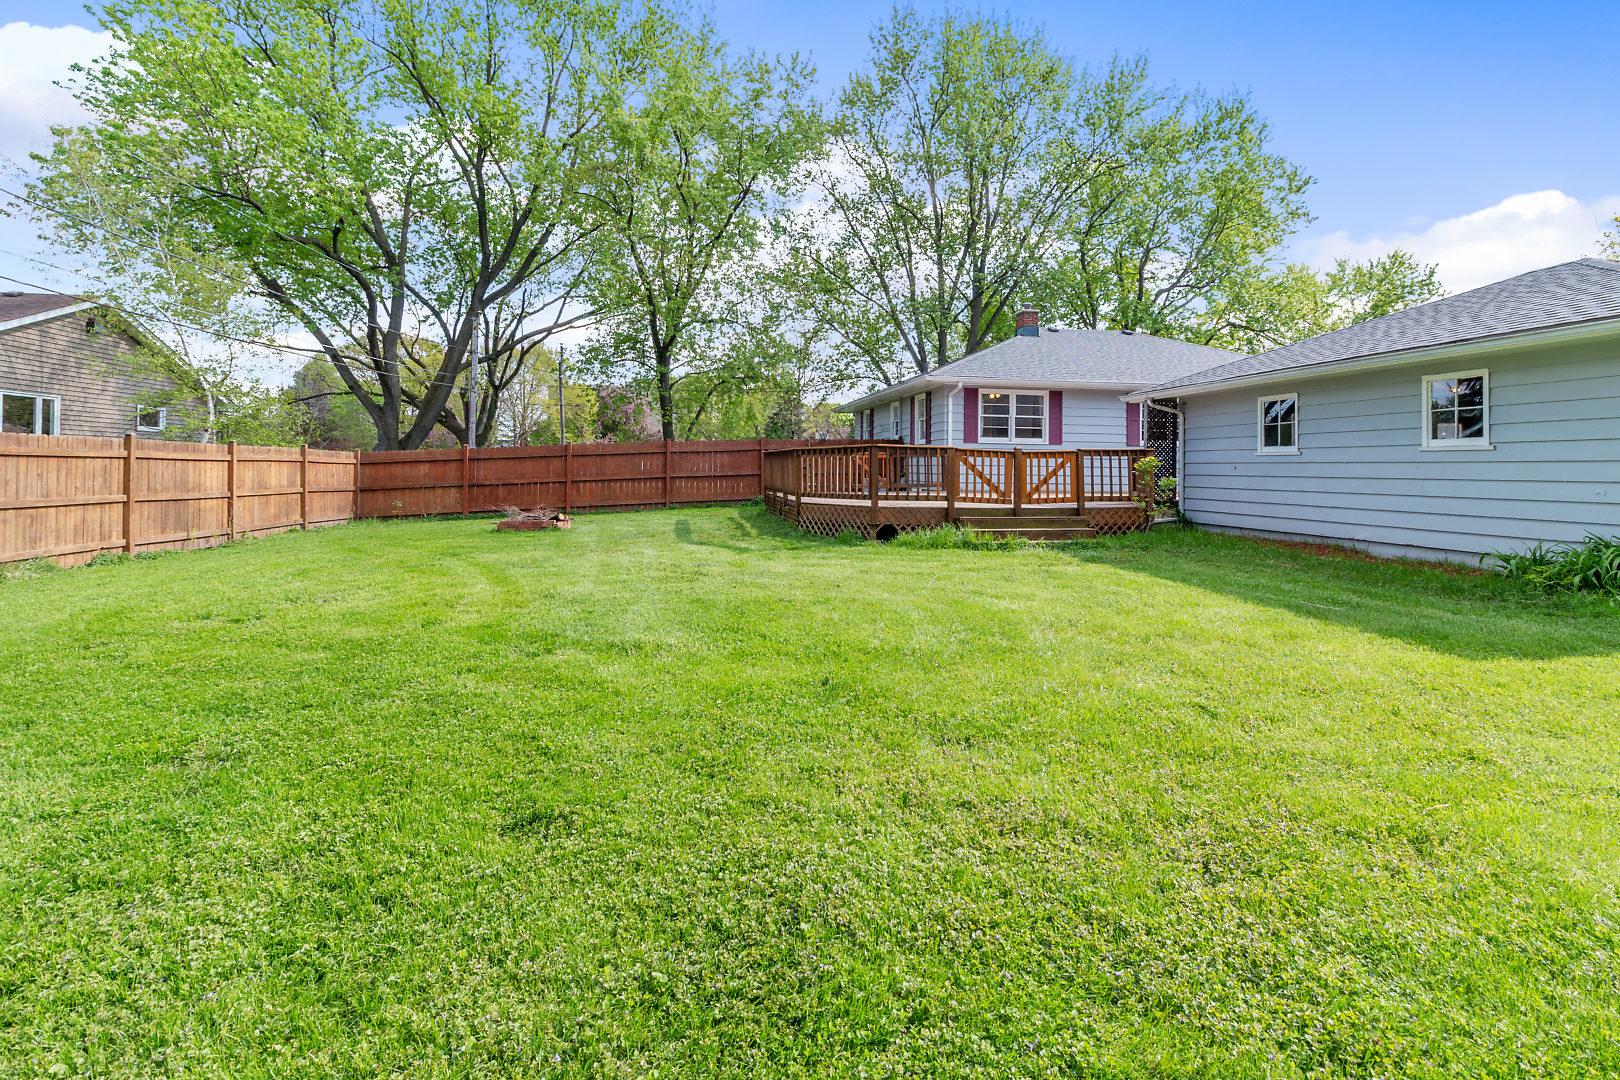 1845 North Marywood, AURORA, Illinois, 60505